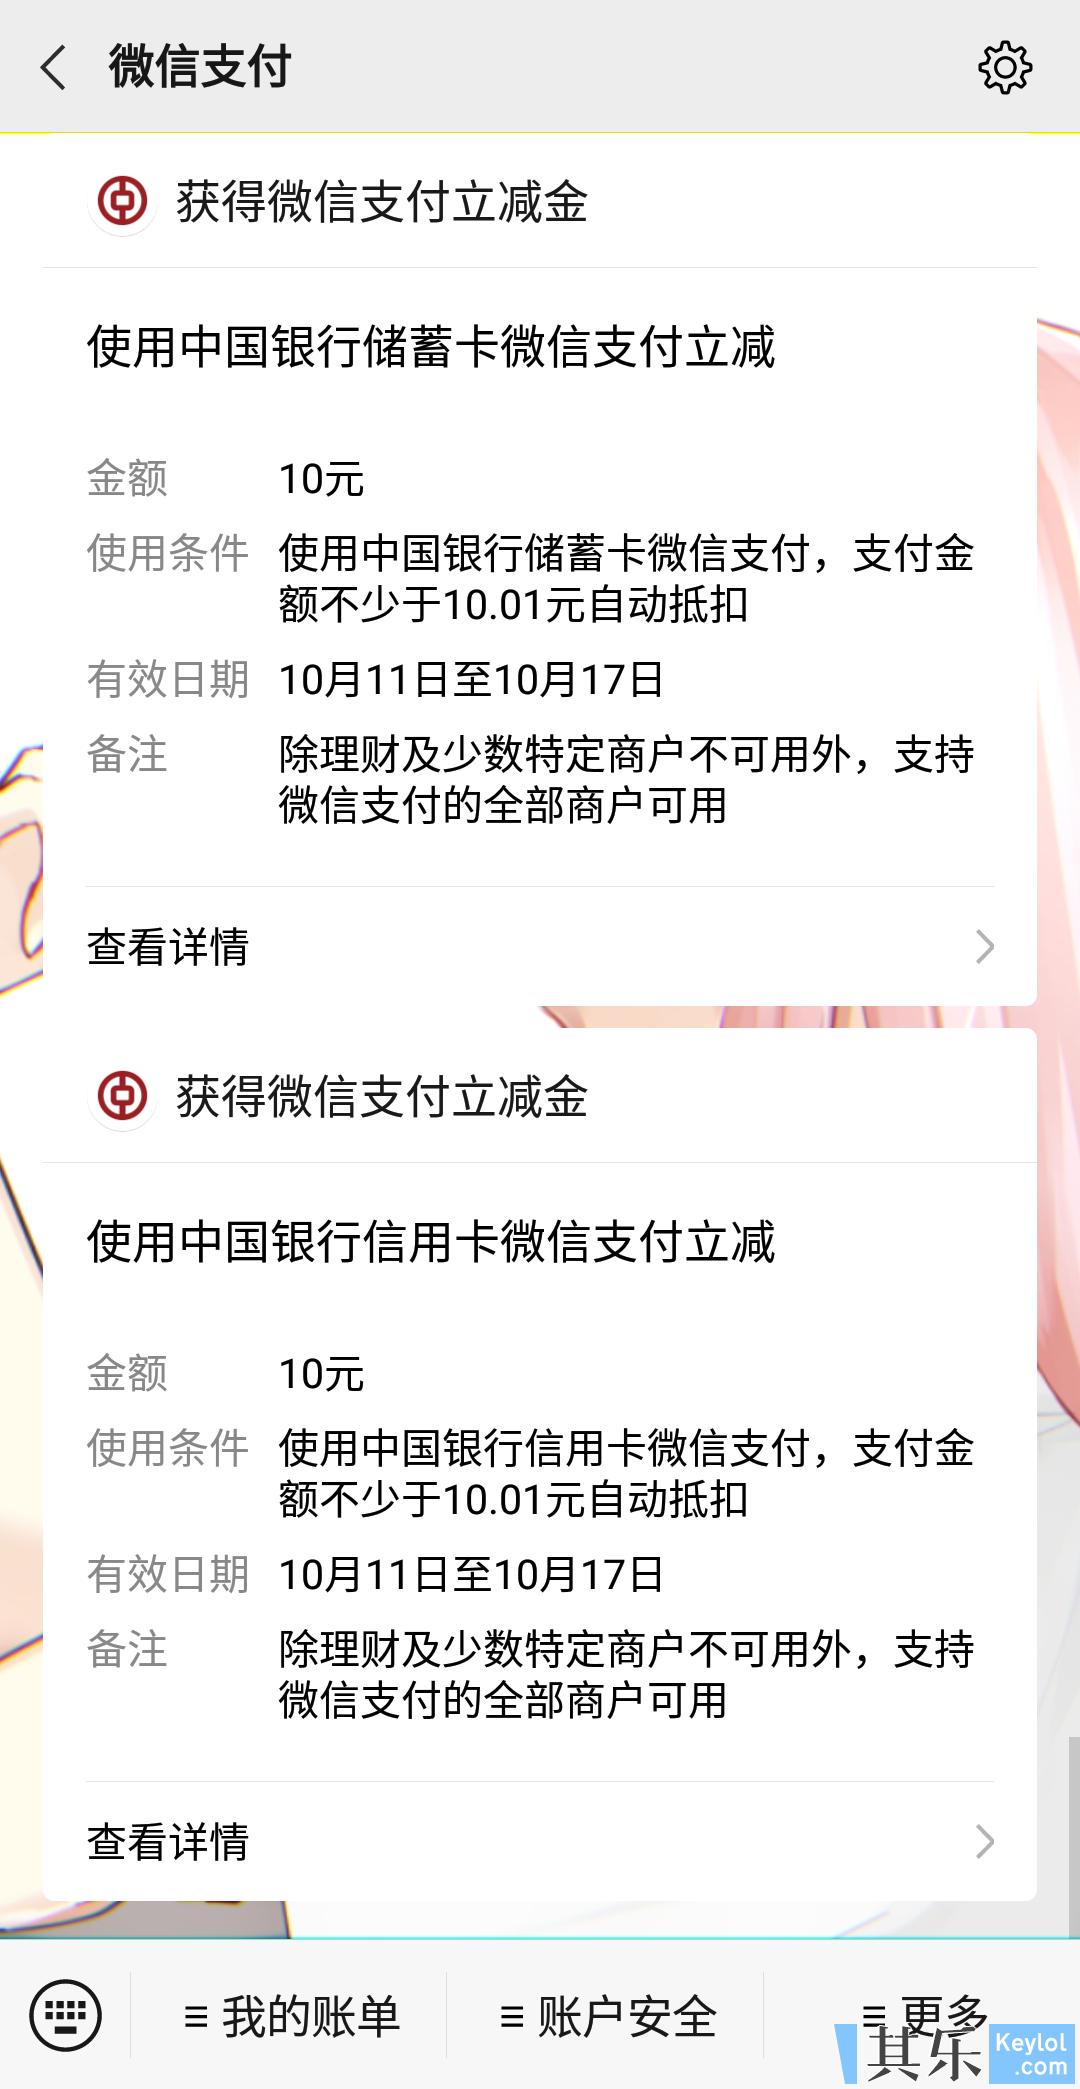 Screenshot_2020-10-11-10-36-25.png